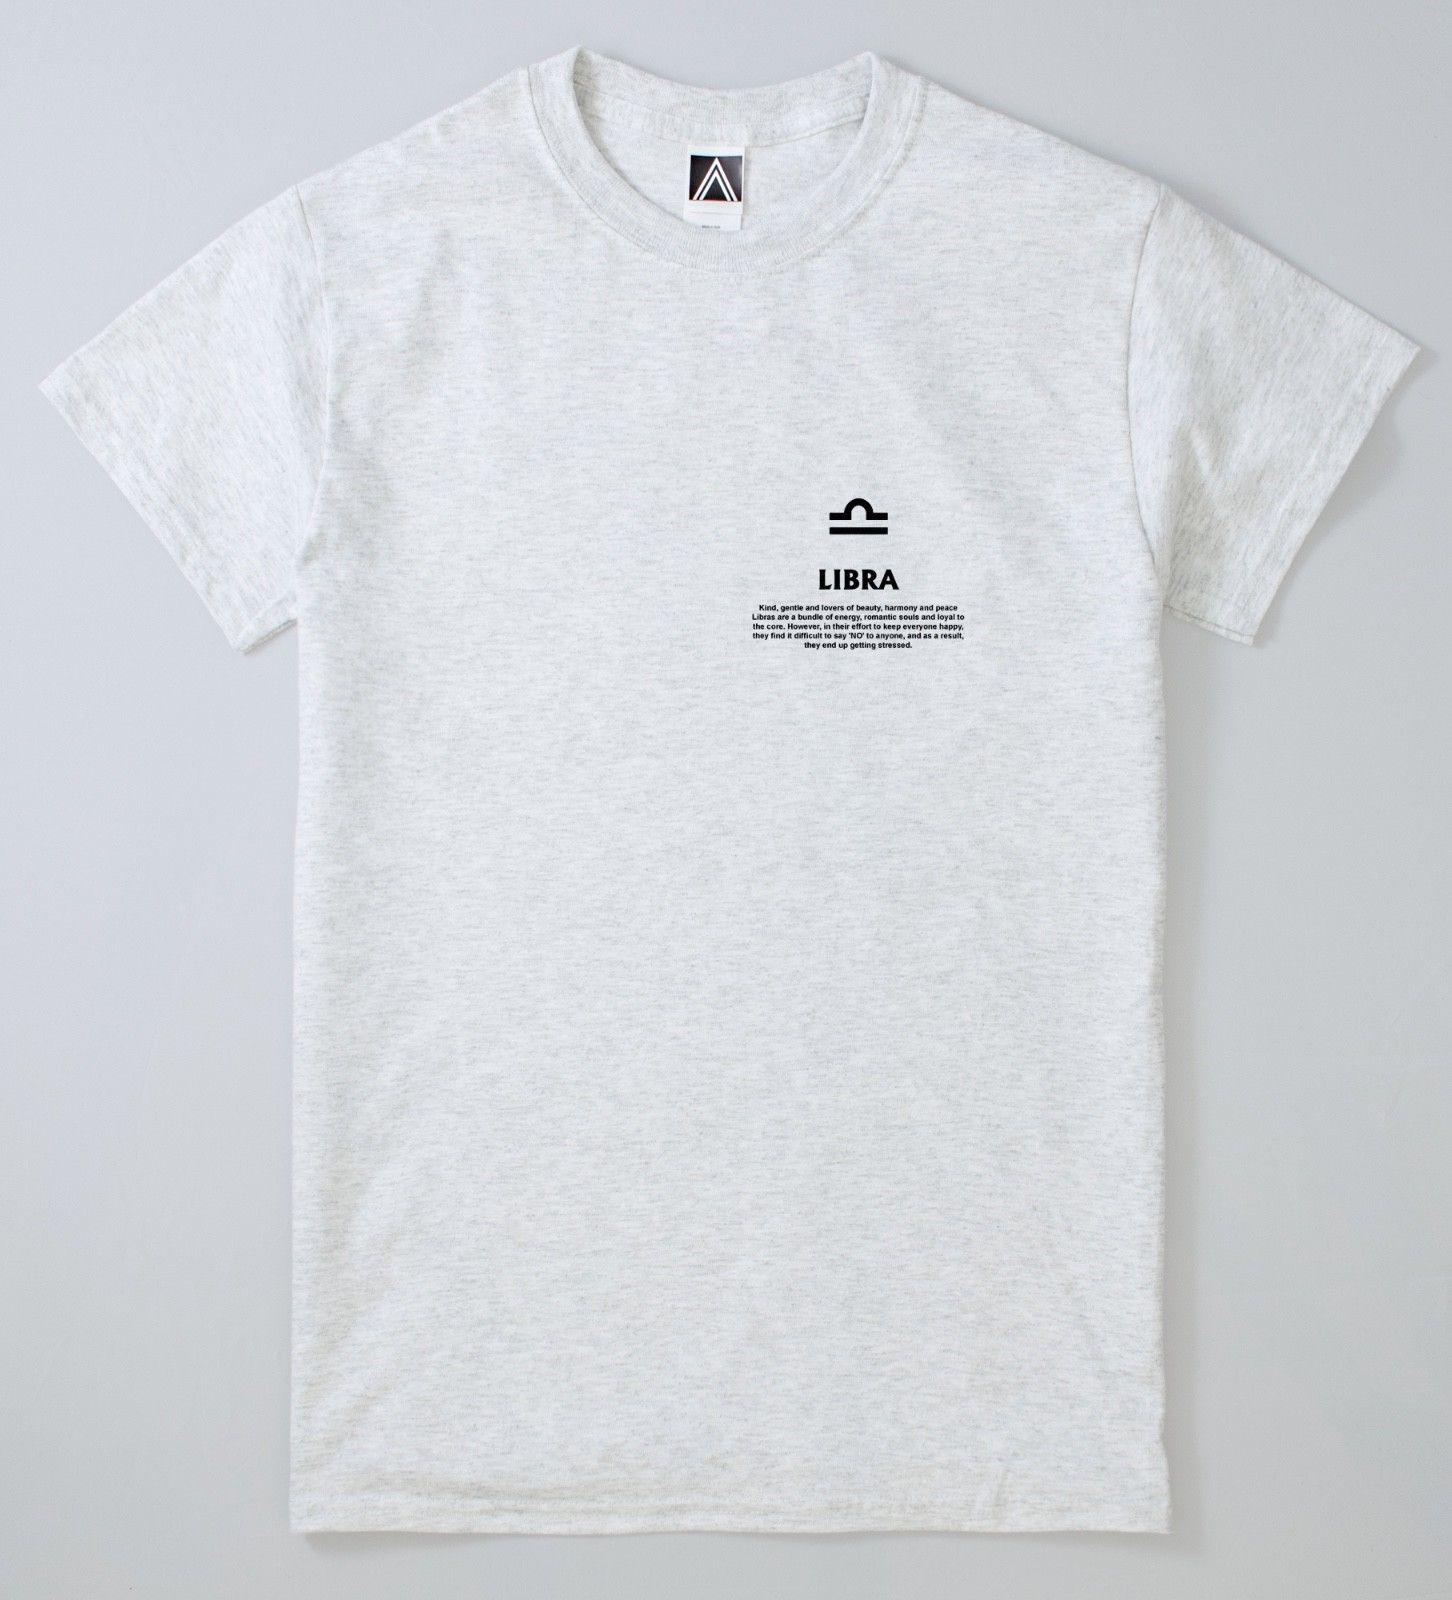 a2ac8f7d Libra T Shirt Zodiac September Magic Tee Horoscope Astrology Tarot Cards  Top Classic Quality High T Shirt Jersey Print T Shirt Cool Sweatshirts  Online ...